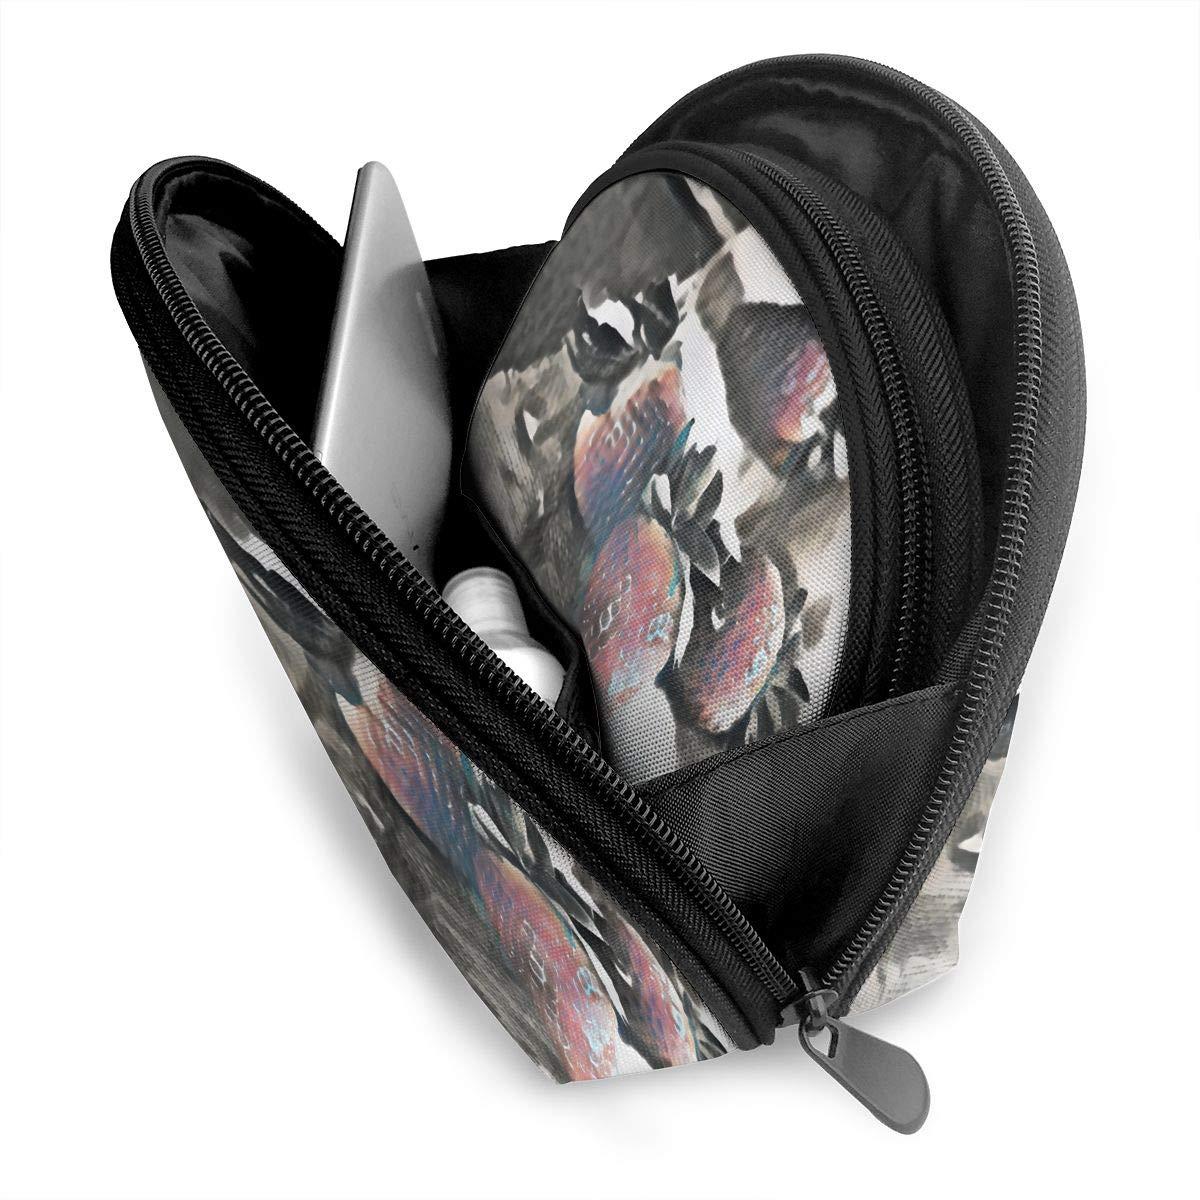 HJDKFIW Personalized Strawberries Womens Shell Shape Carrying Case Organizer Bag Gift 2Pcs